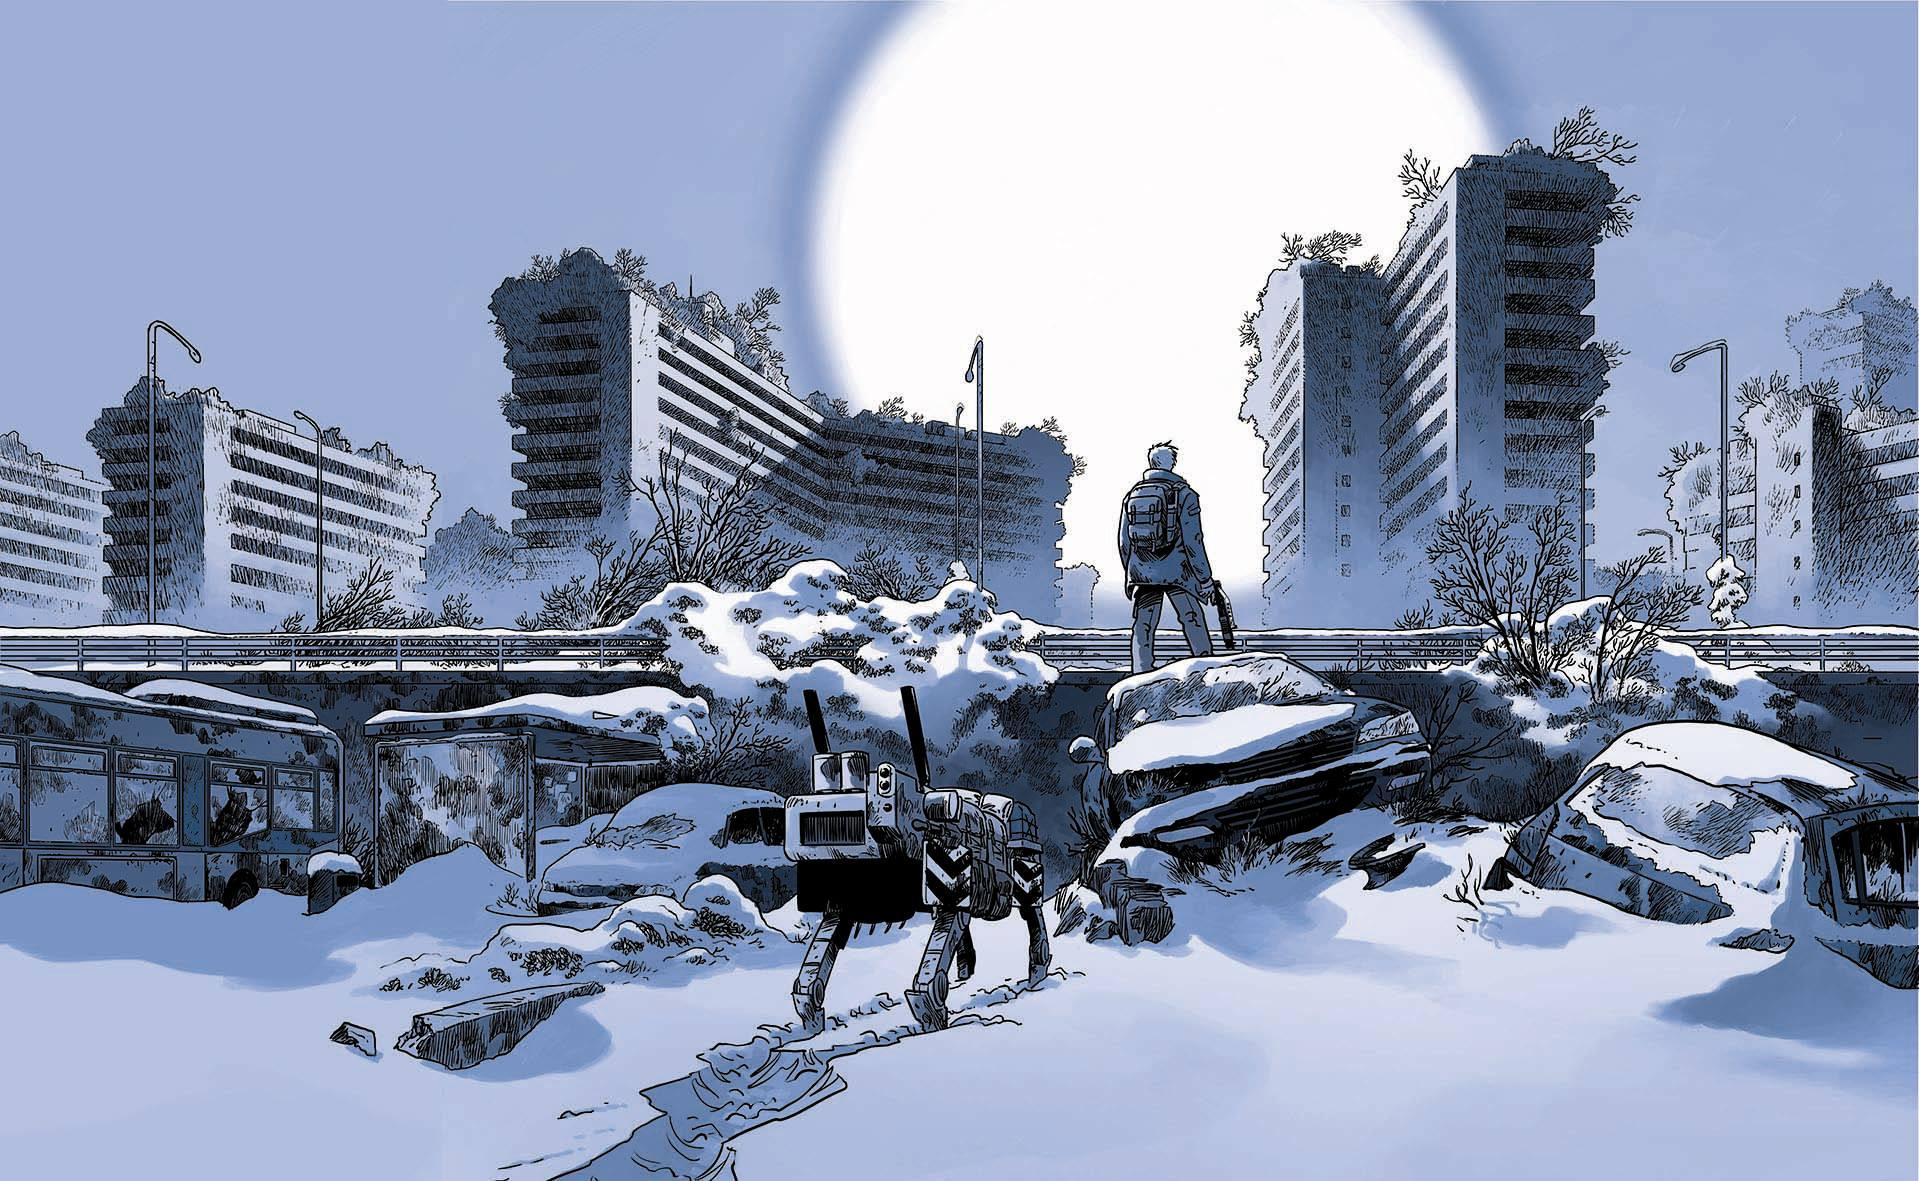 Soleil Froid - Pecau - Damien - T.1 - H5n4 - ville deserte